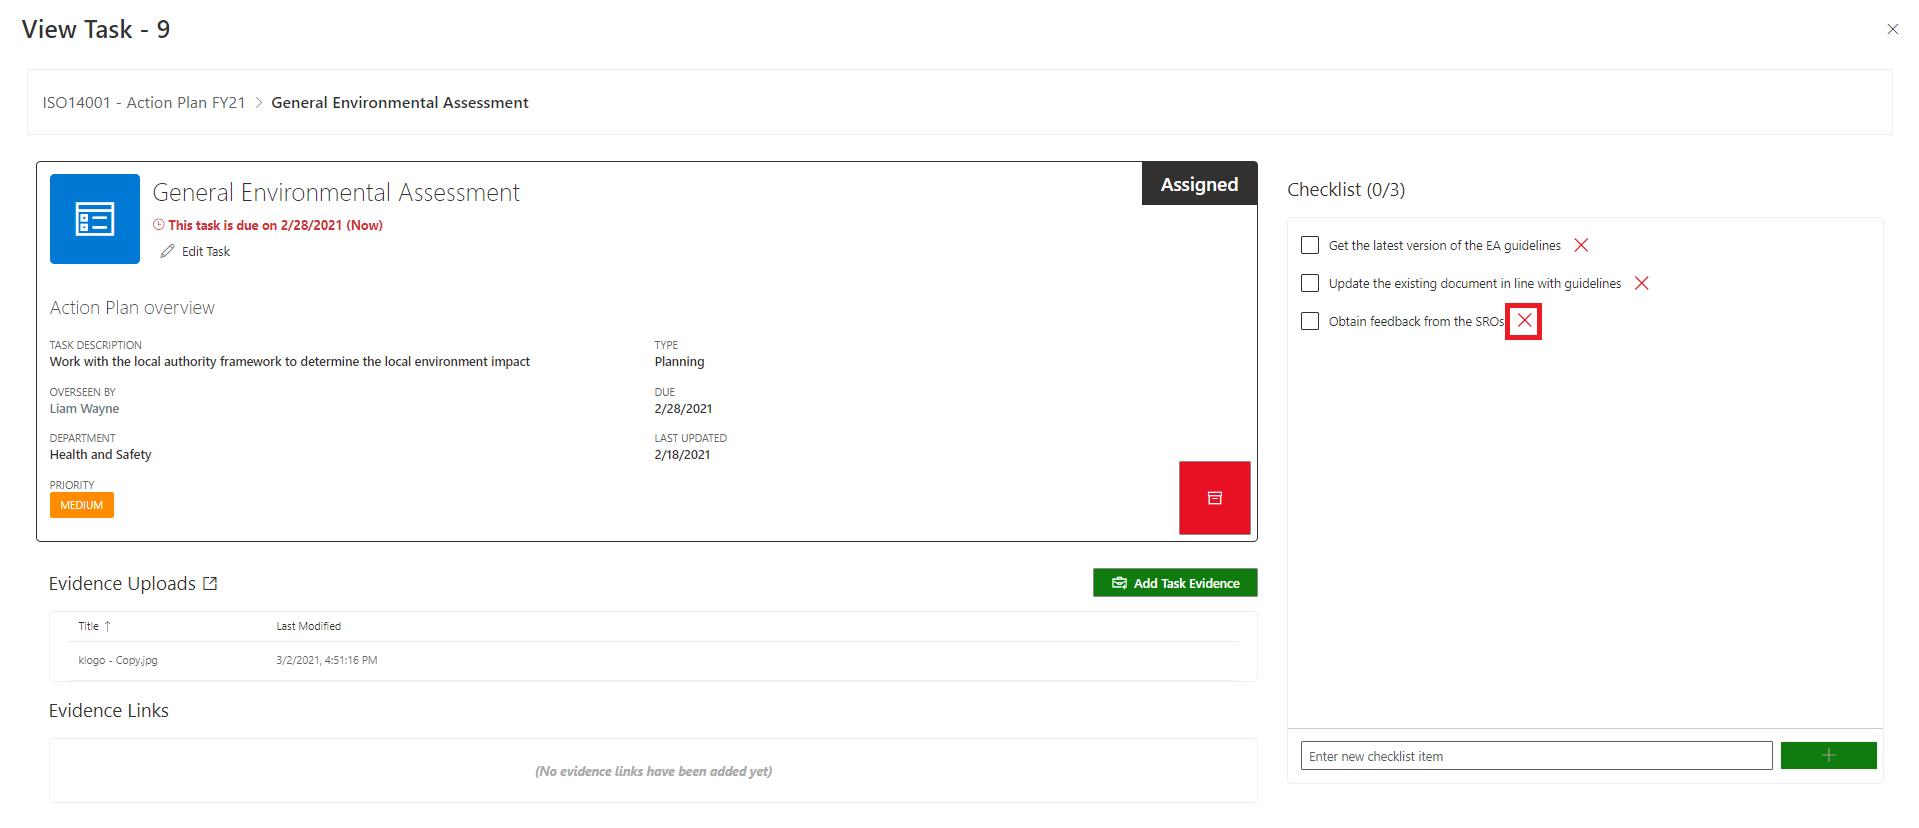 Create Checklist item 3